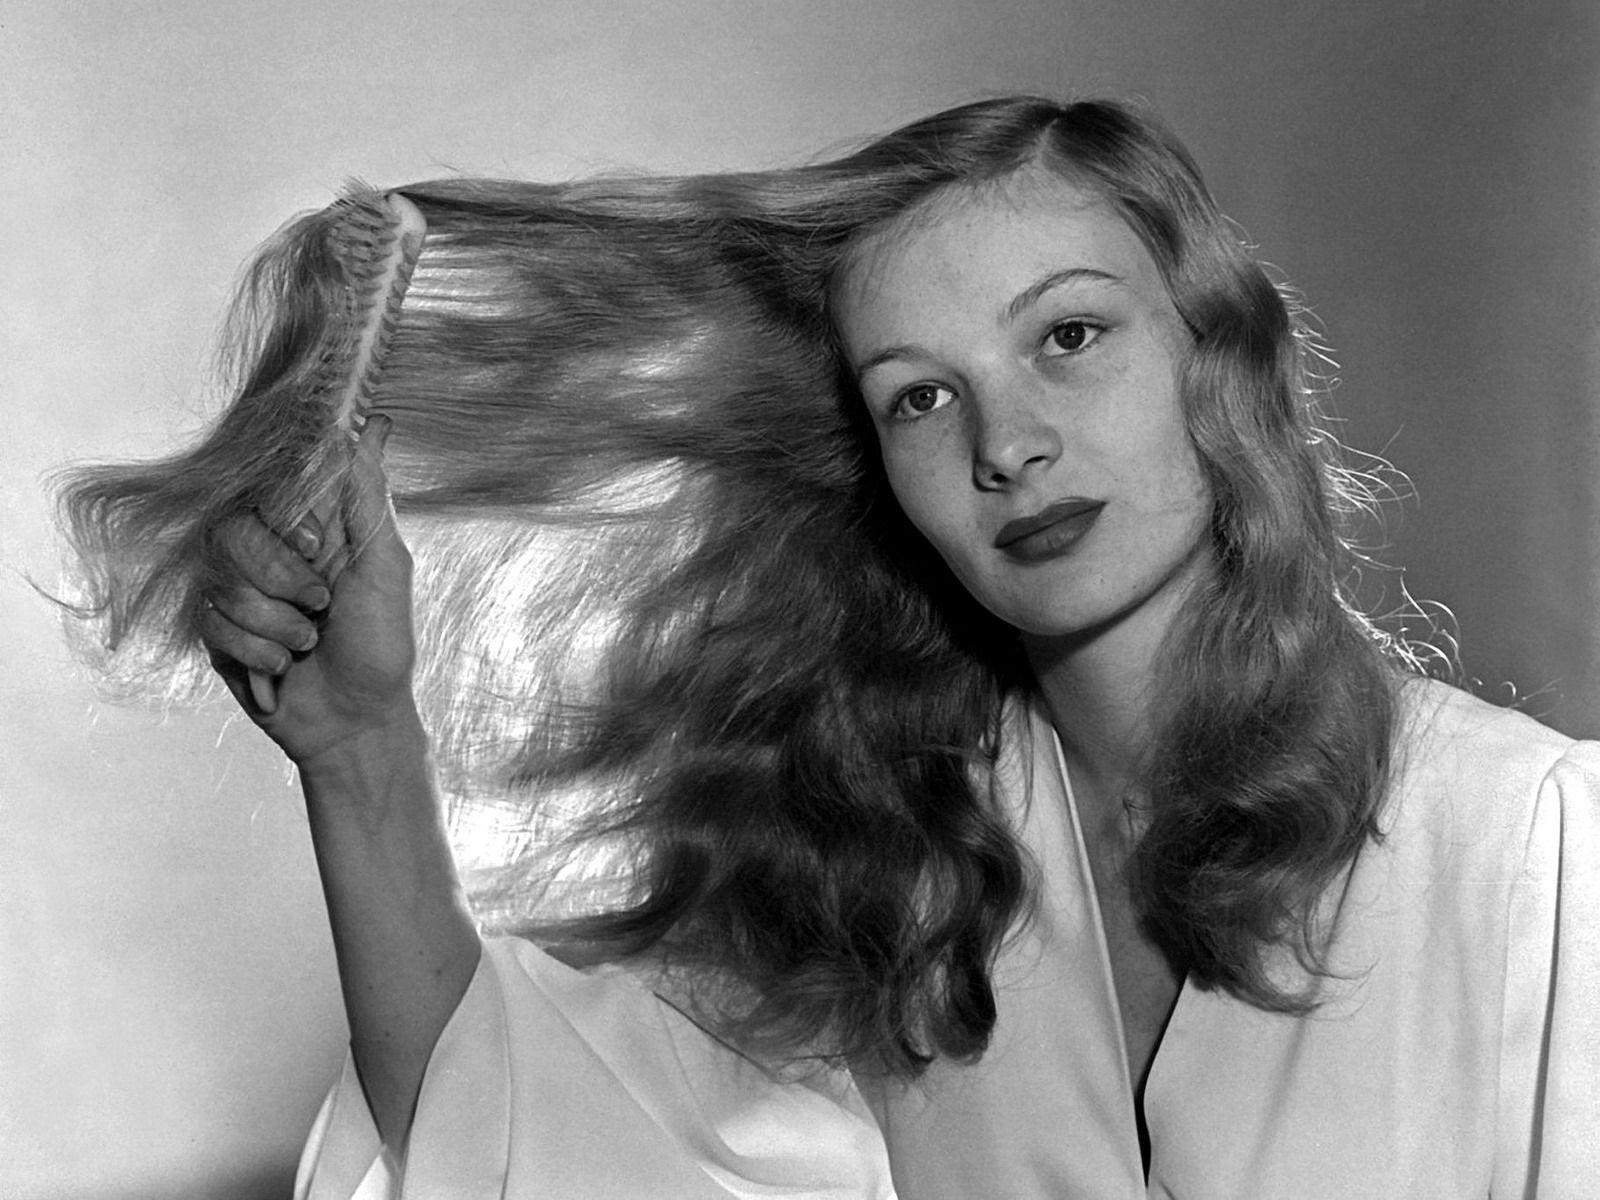 Veronica lake the warmest cool blonde in noir rest in suspense